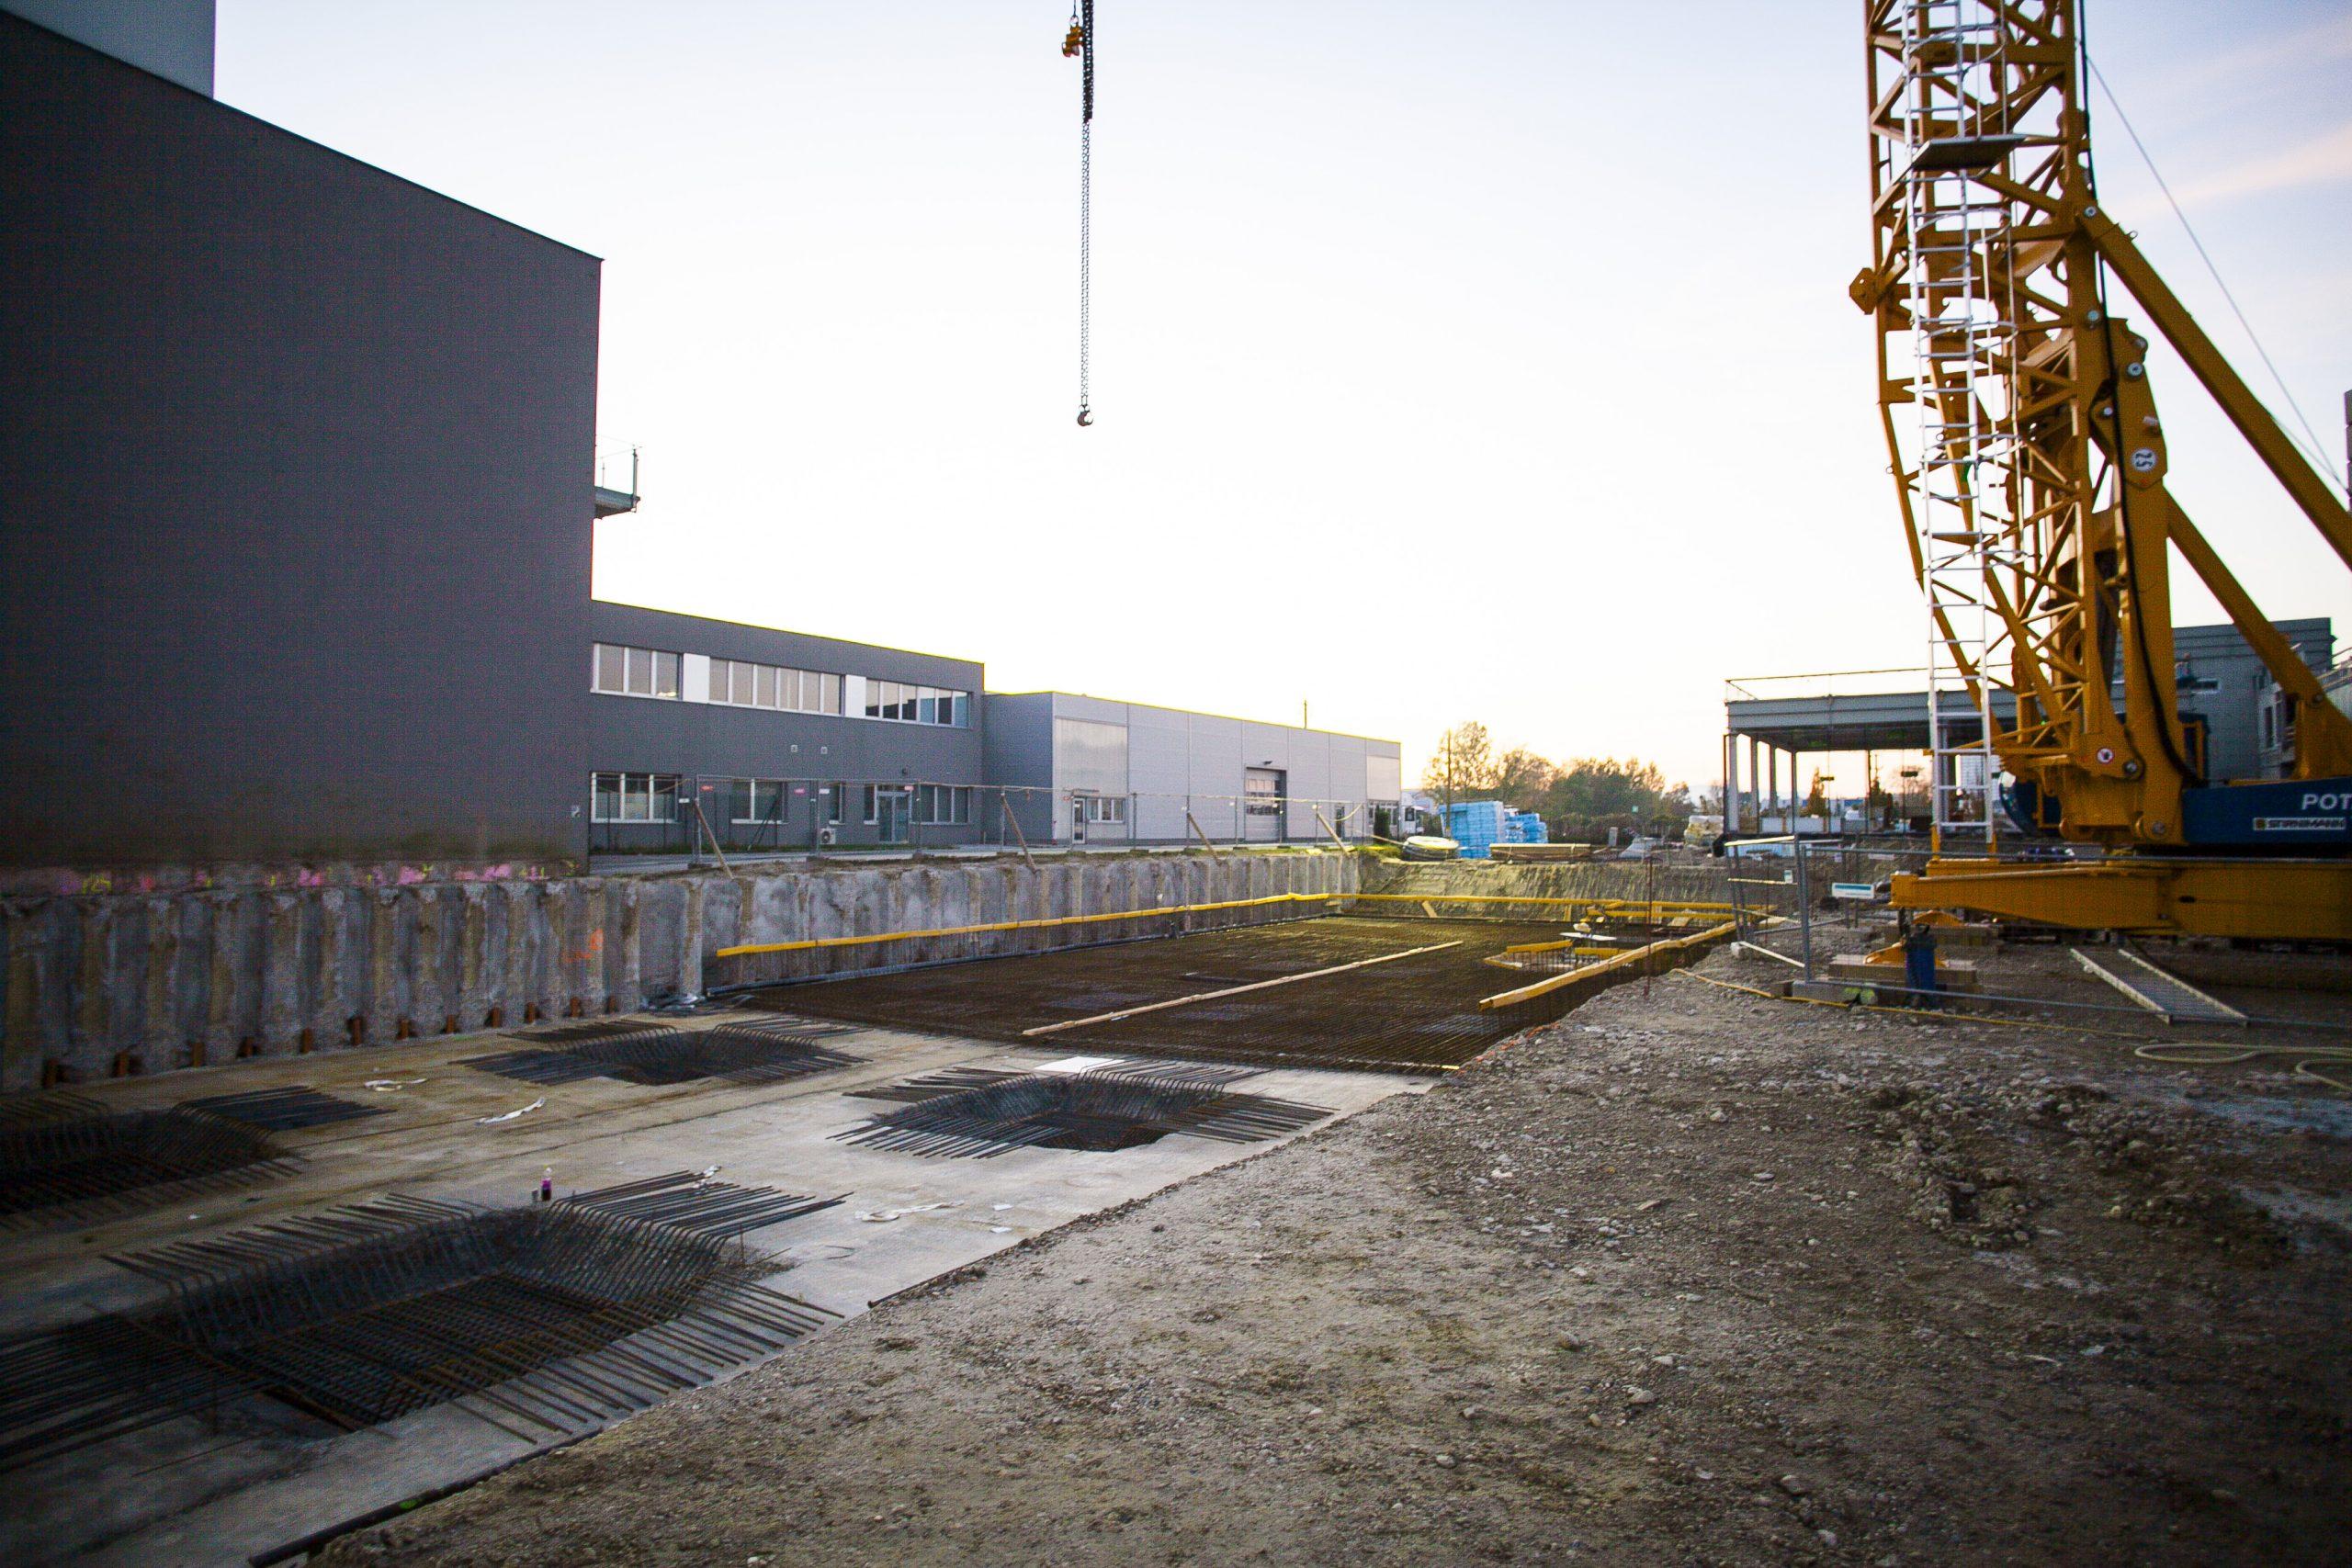 AUTO STAHL Wien 22 | Bauteil Ford | Oktober 2020